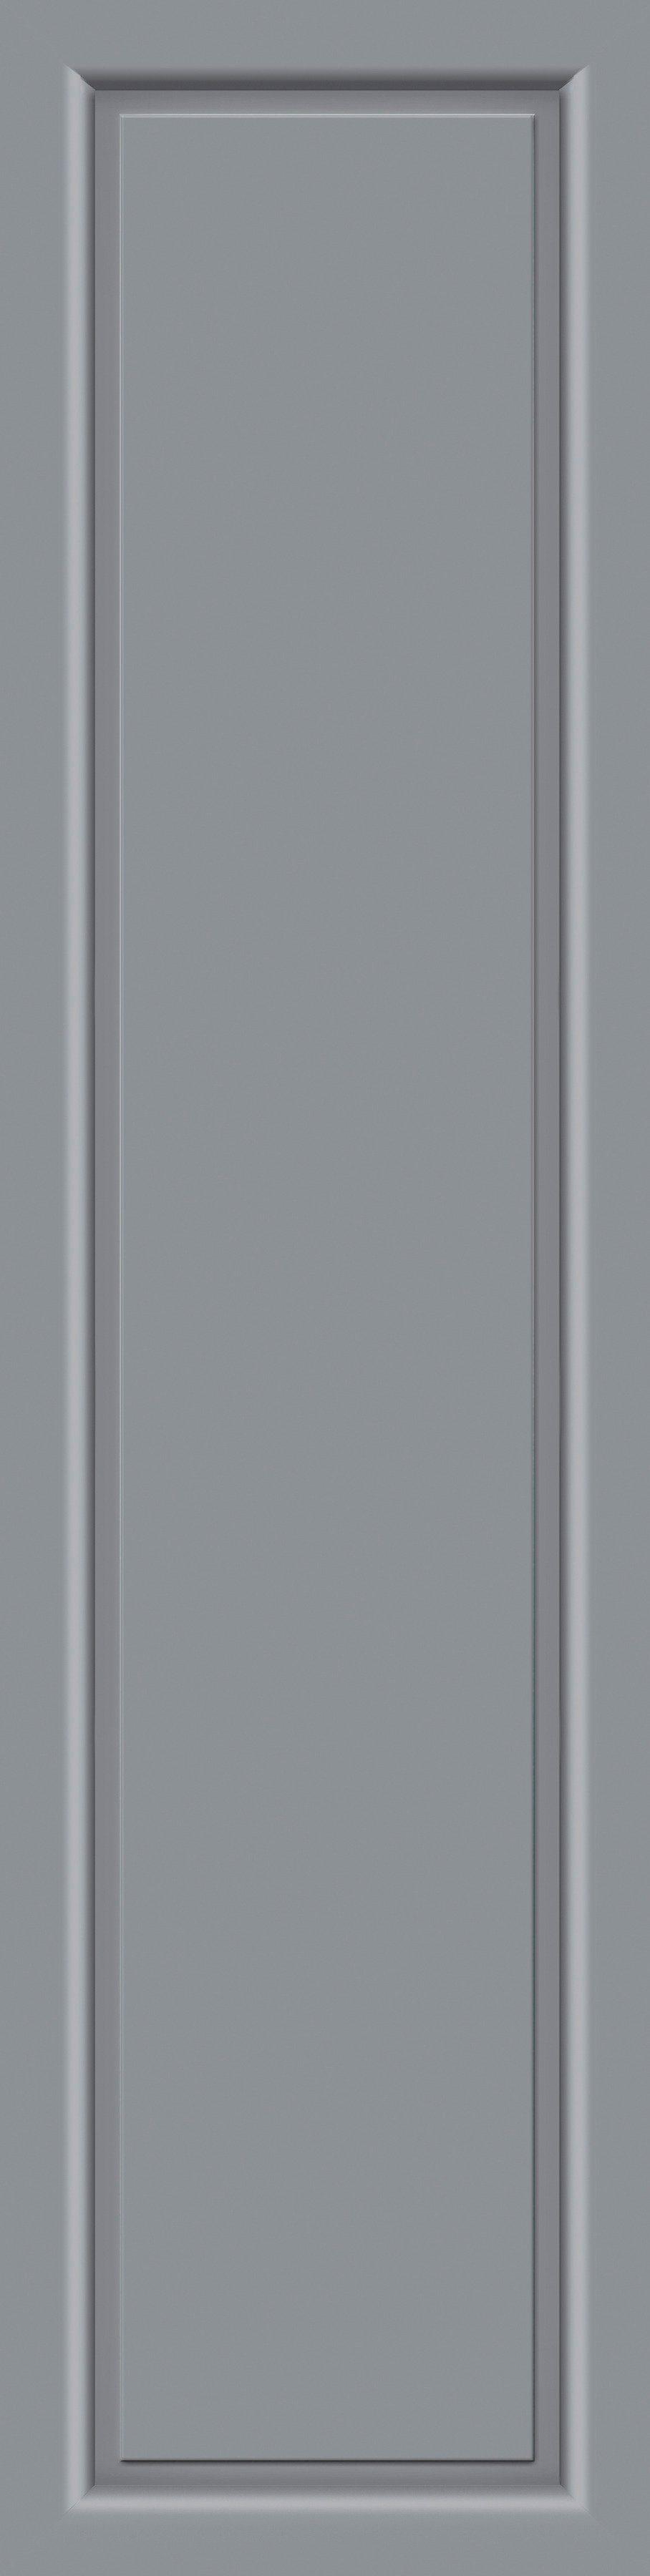 KM MEETH ZAUN GMBH Seitenteile »S04«, für Alu-Haustür, BxH: 60x198 cm, grau